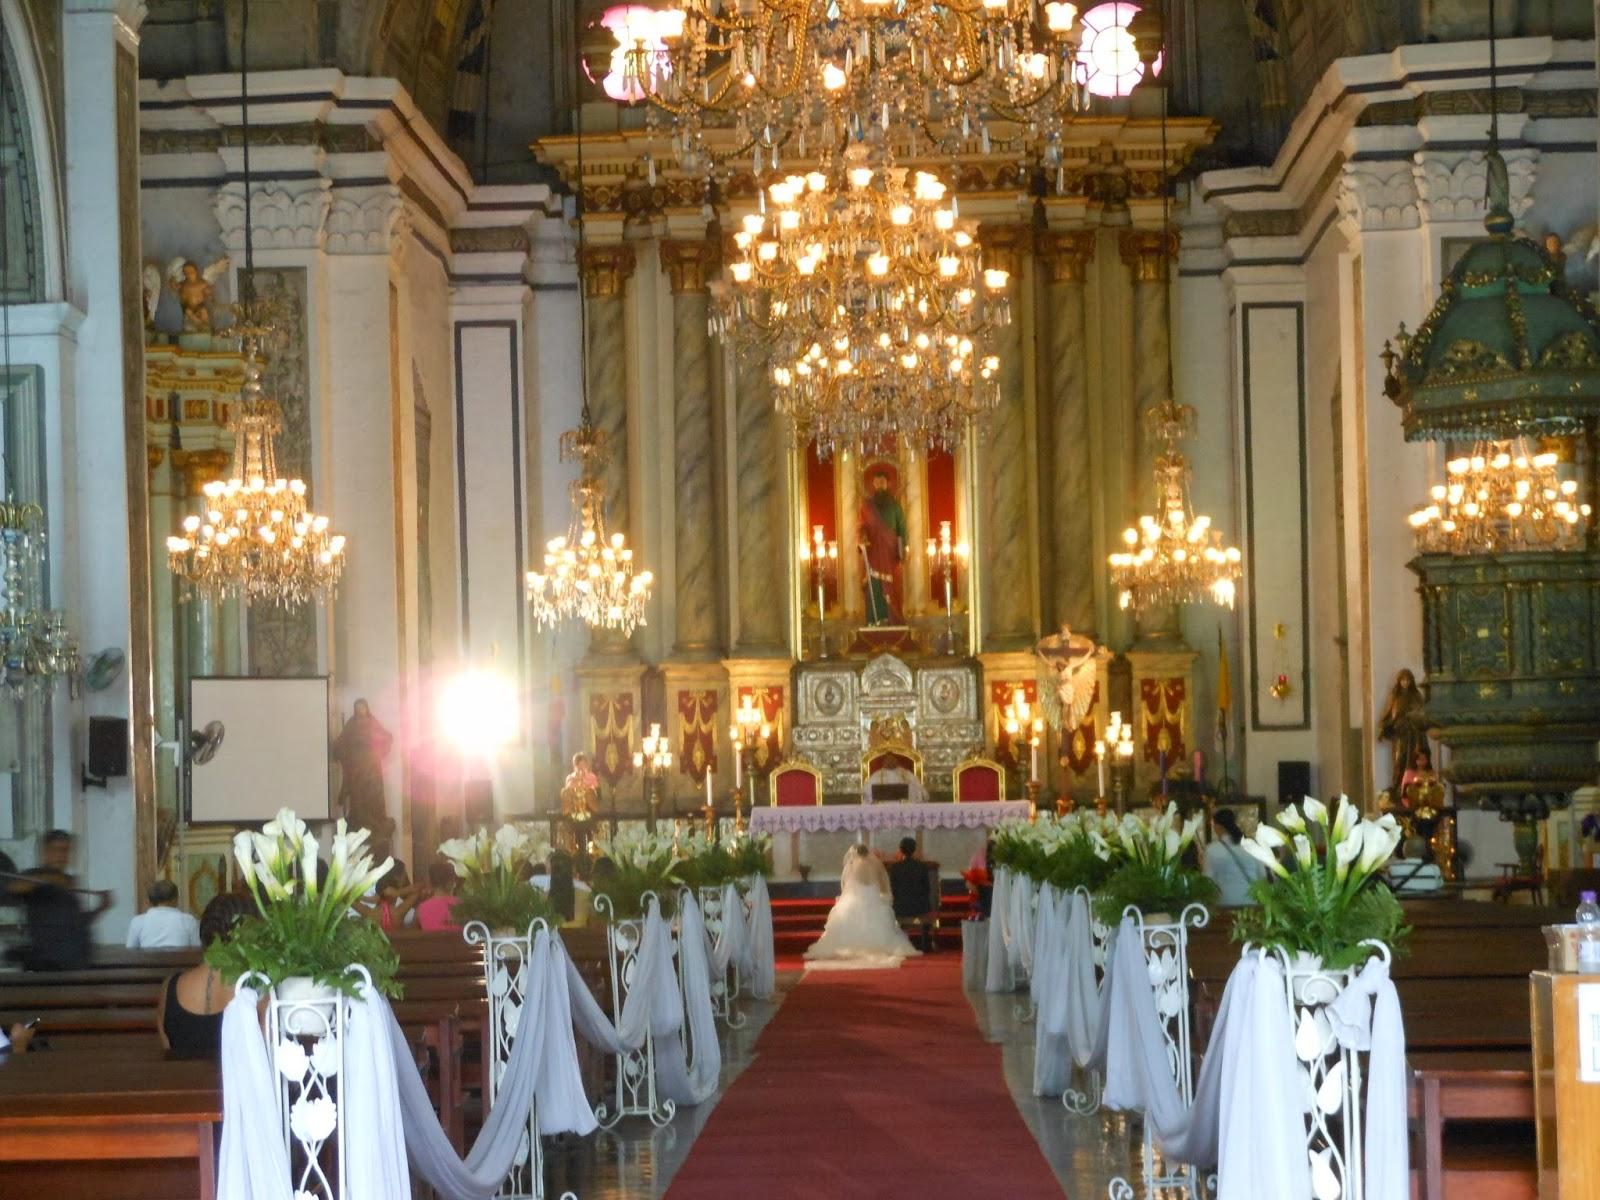 San jose court wedding